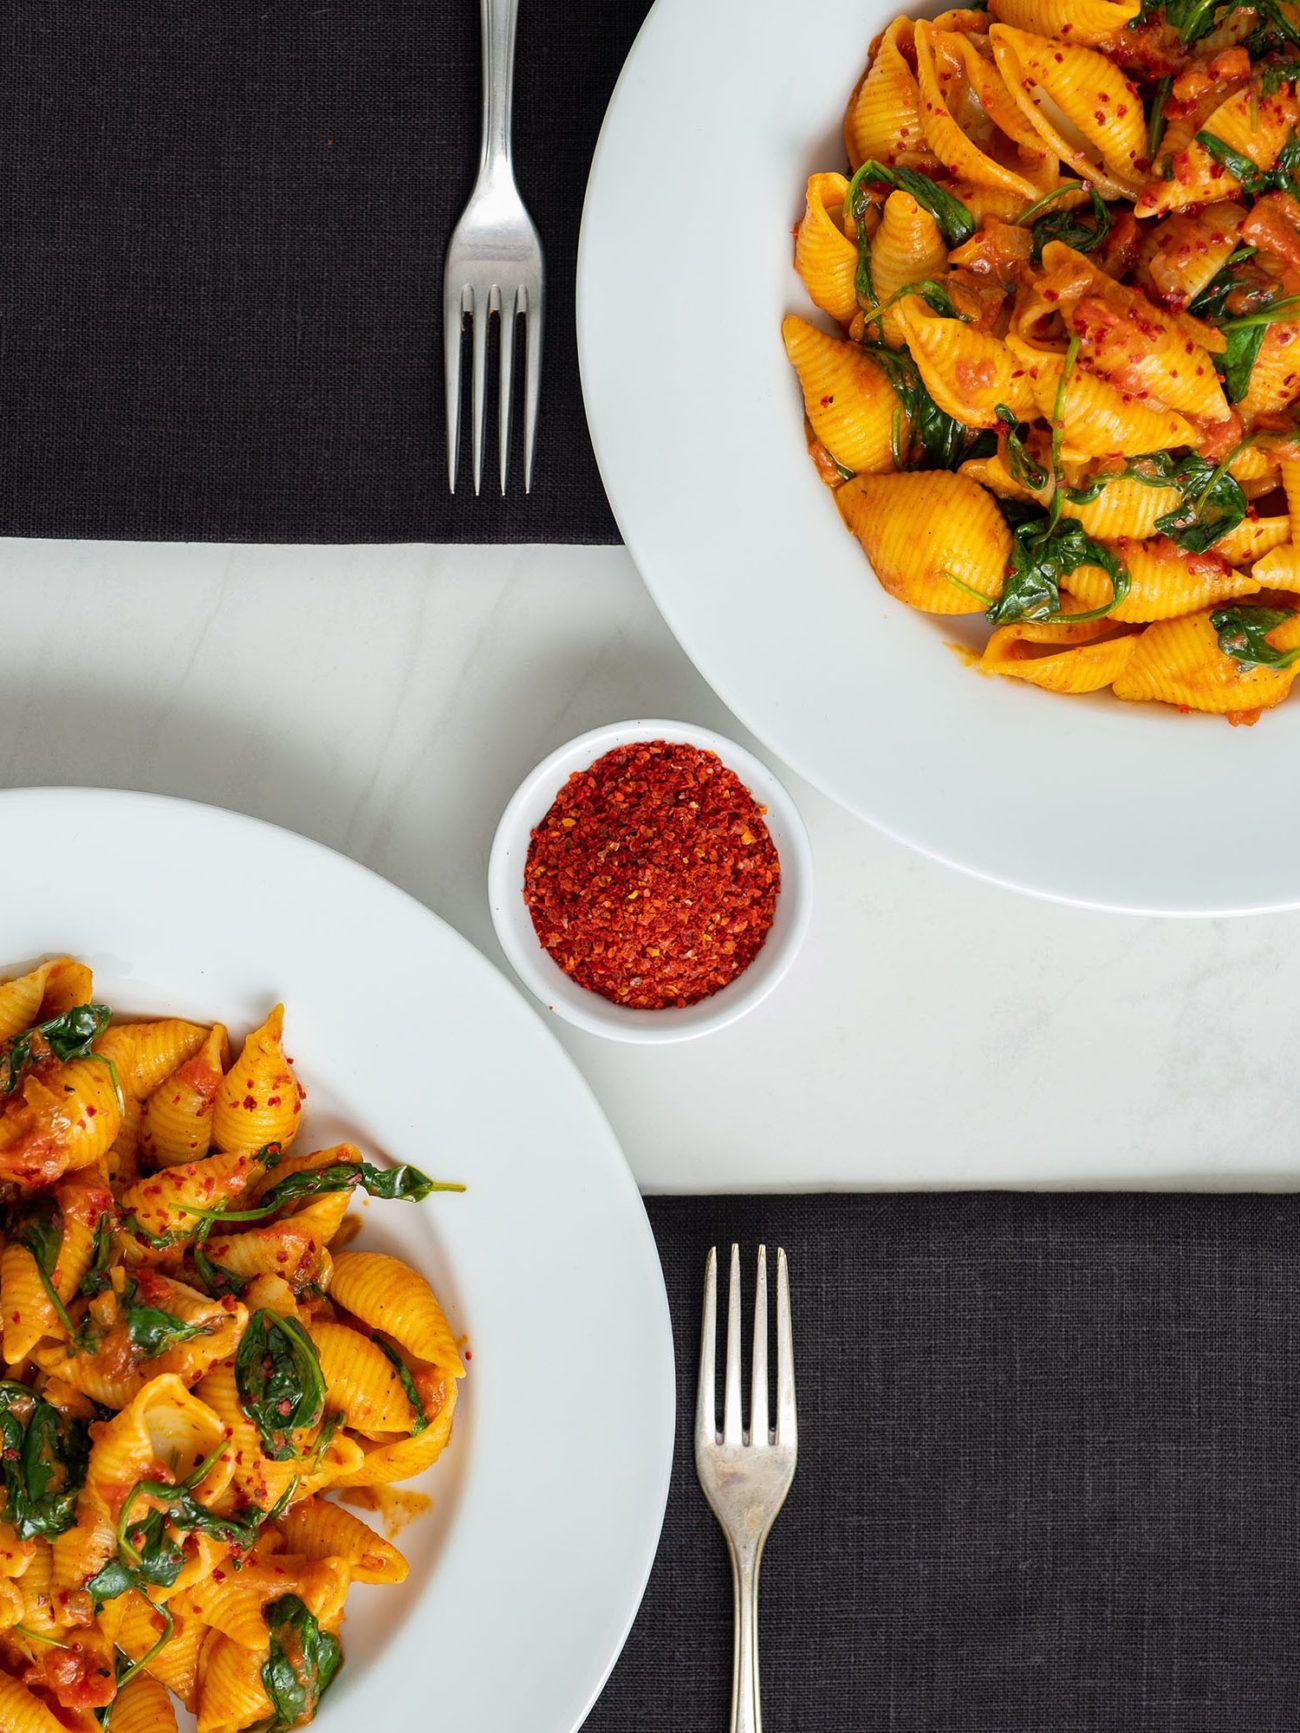 Rezept_Pasta mit Tomaten-Spinat-Sauce, Chili, Gabeln, Servietten